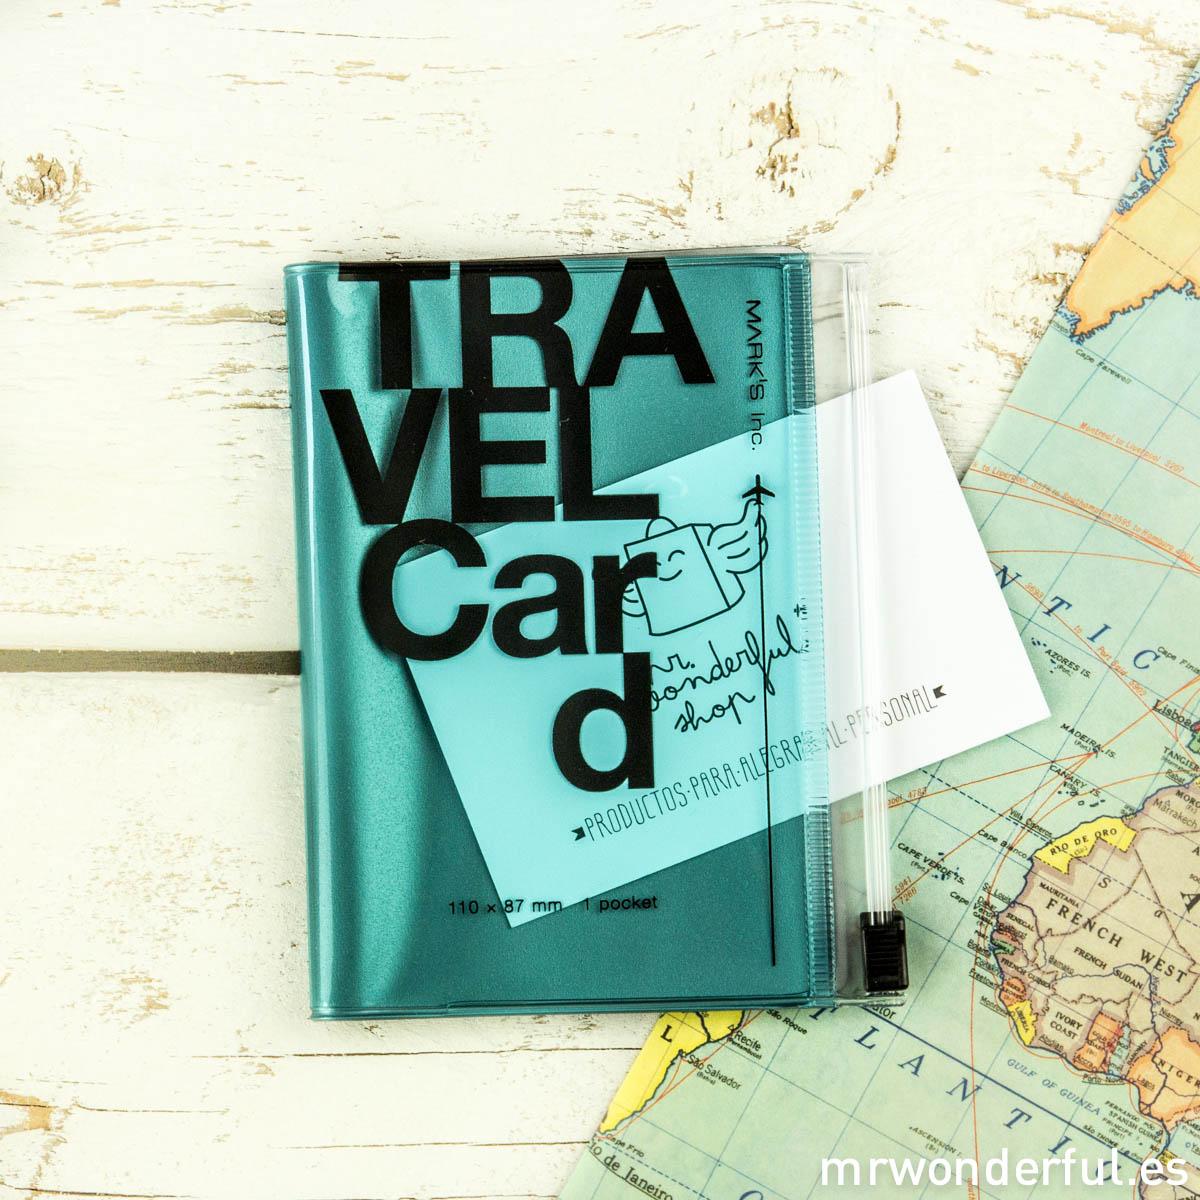 mrwonderful_TVK-PAC1-MBL_funda-tarjetas-azul-8